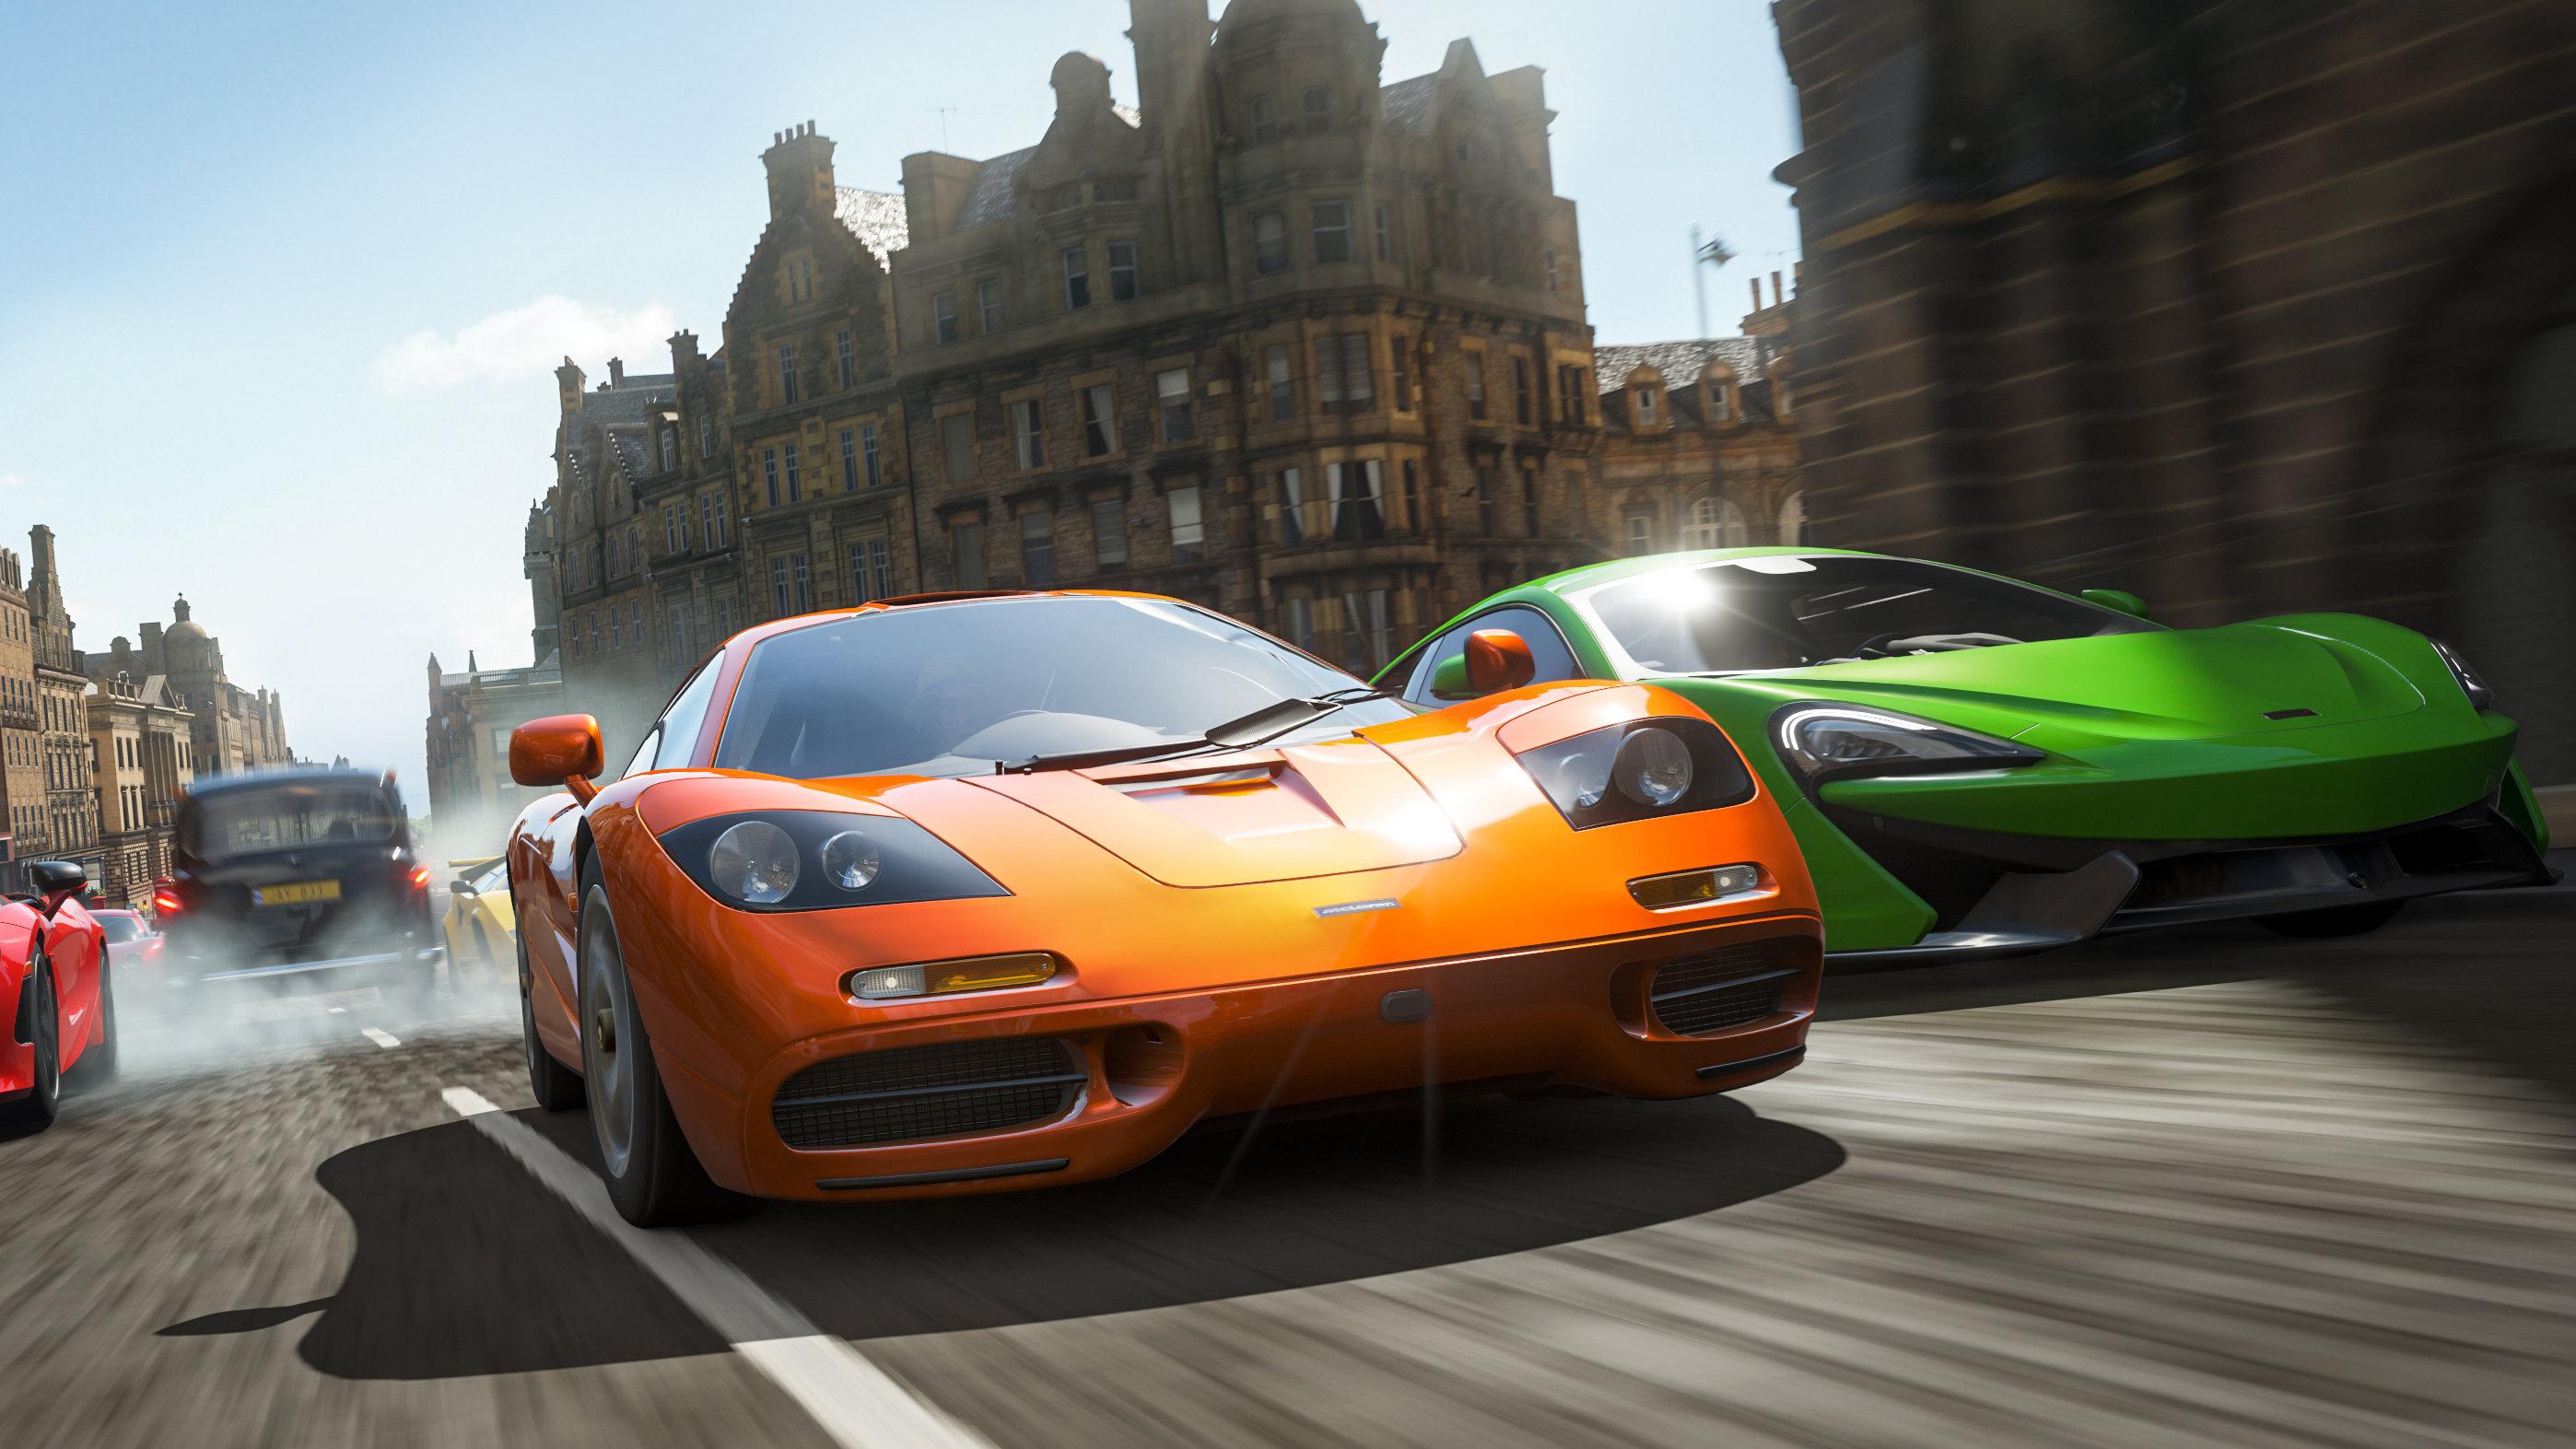 Racing through Edinburgh in a Forza Horizon 4 screenshot.